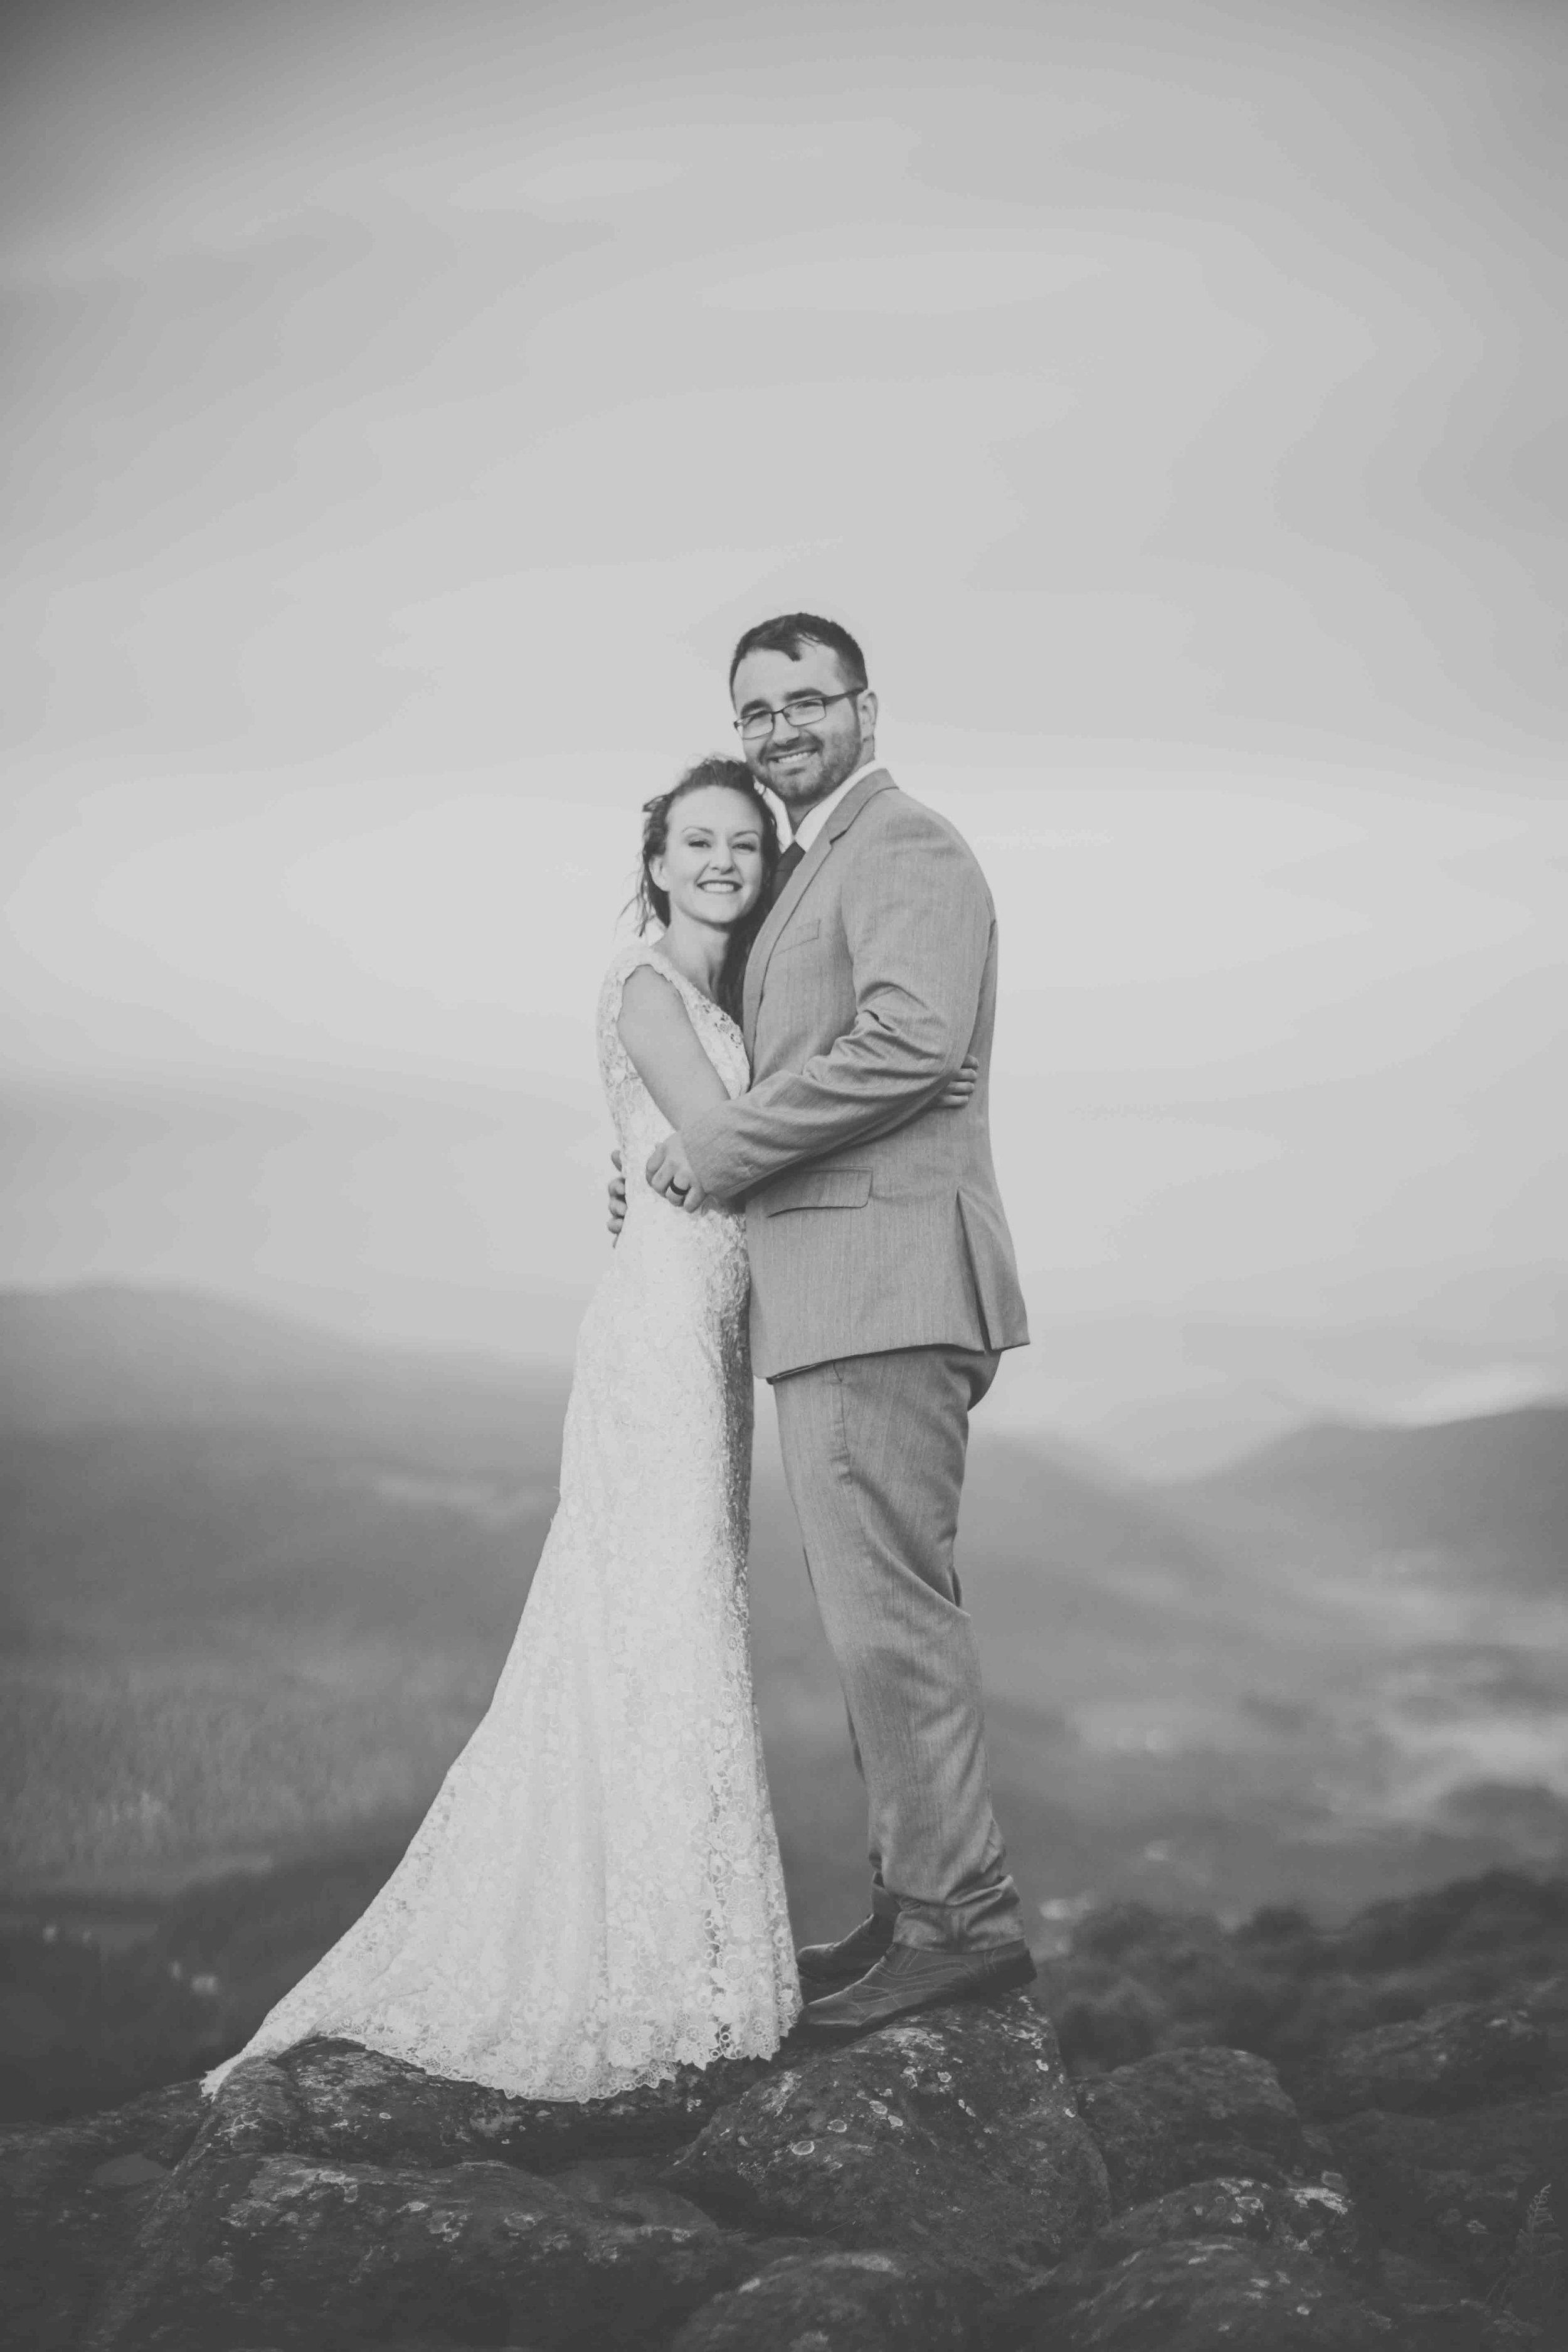 north-carolina-elopement-photographer-71.jpg